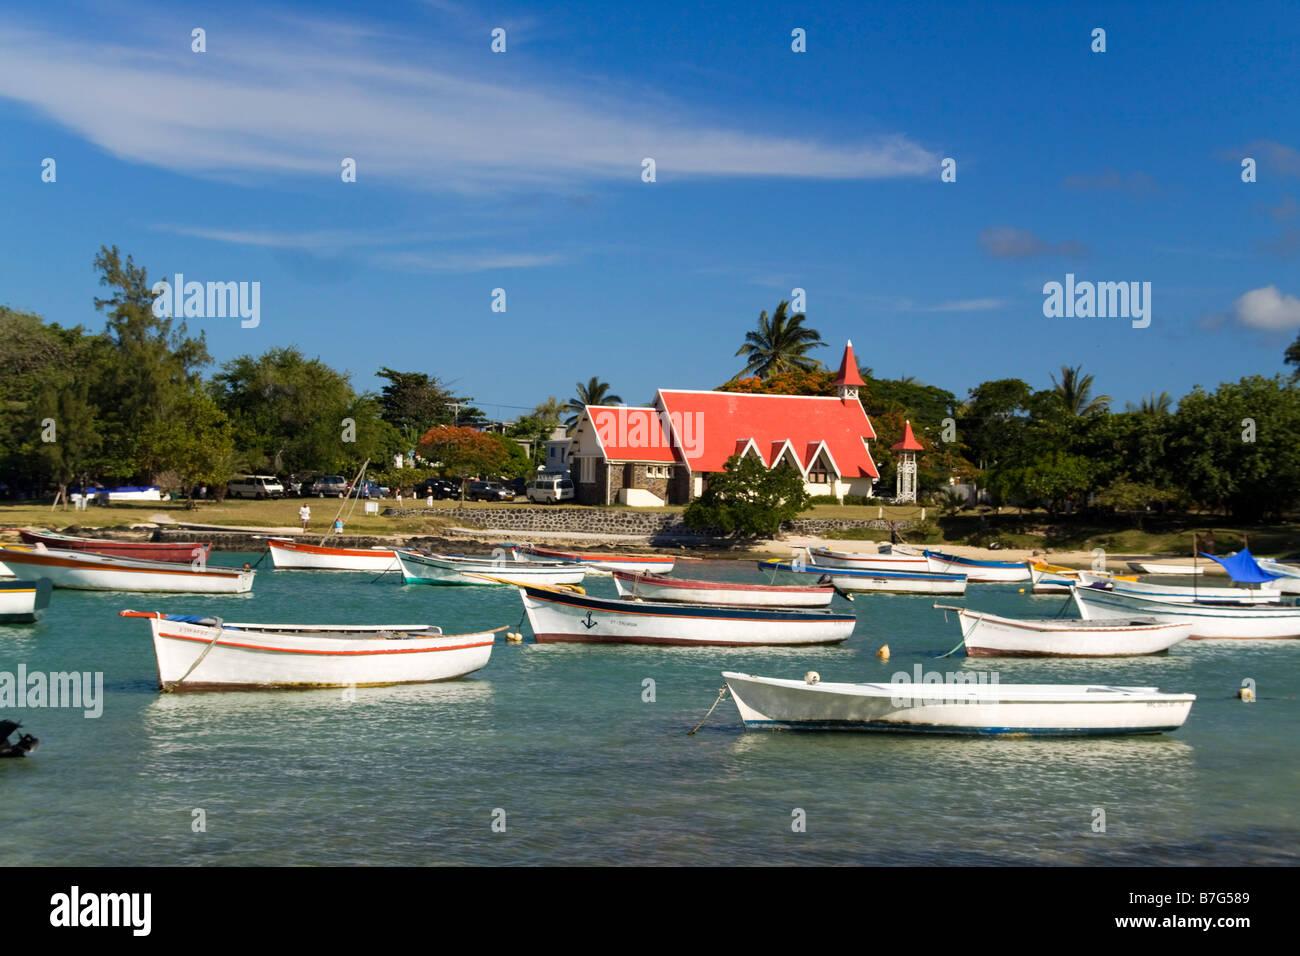 Eglise de Cap Malheureux boats Mauritius Africa - Stock Image